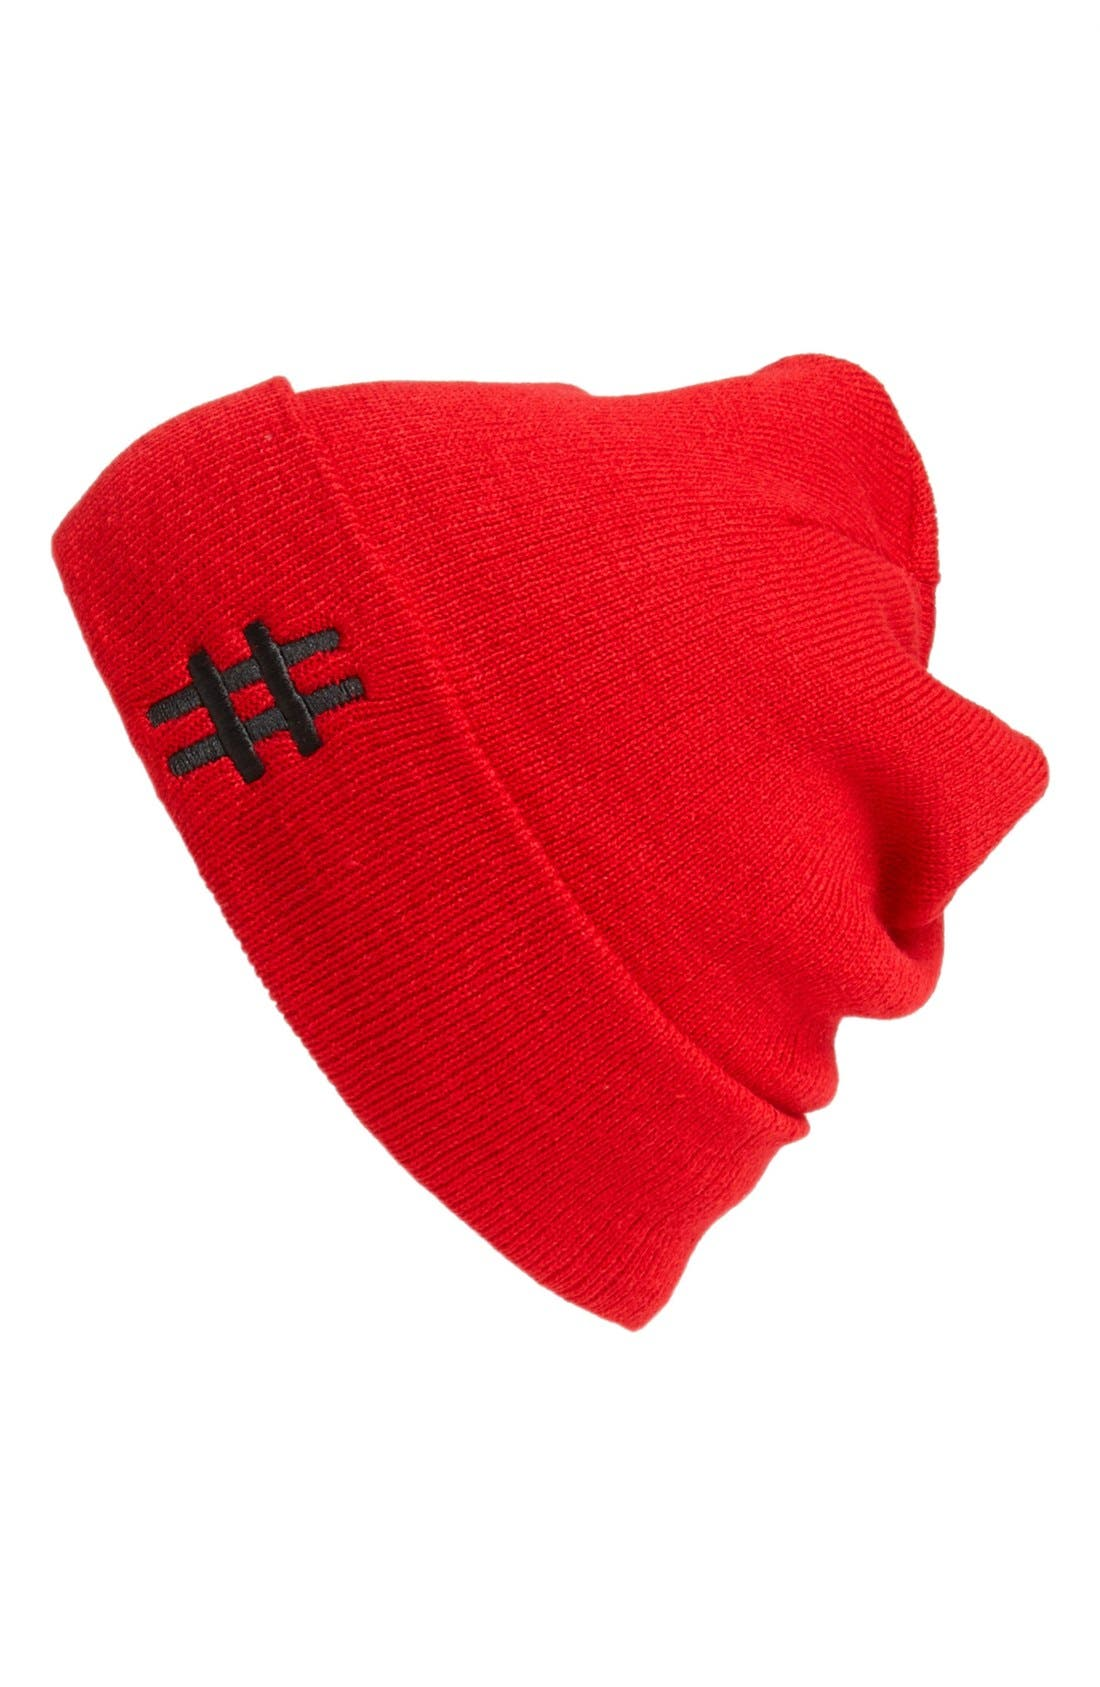 'Hashtag' Beanie,                         Main,                         color,